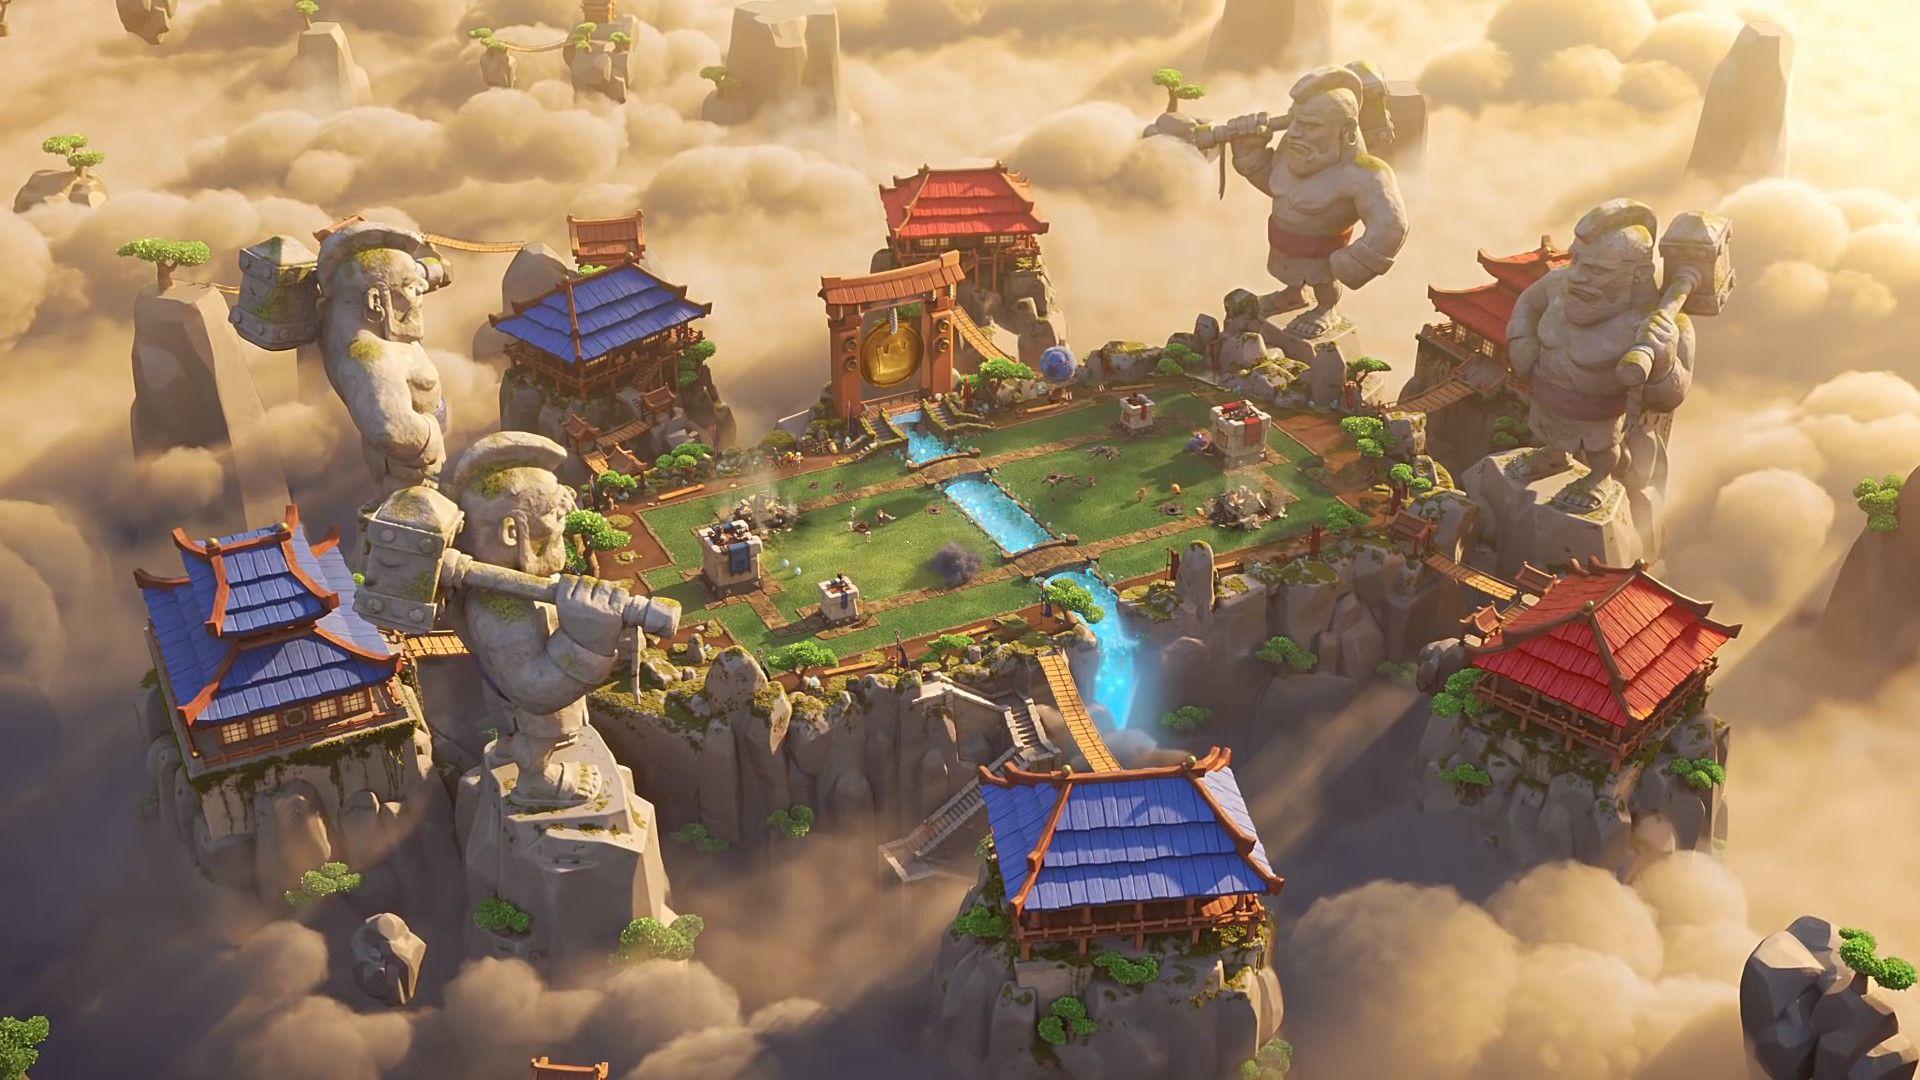 Clash Royale Legendary Arena 1080p Quality Wallpaper Clash Of